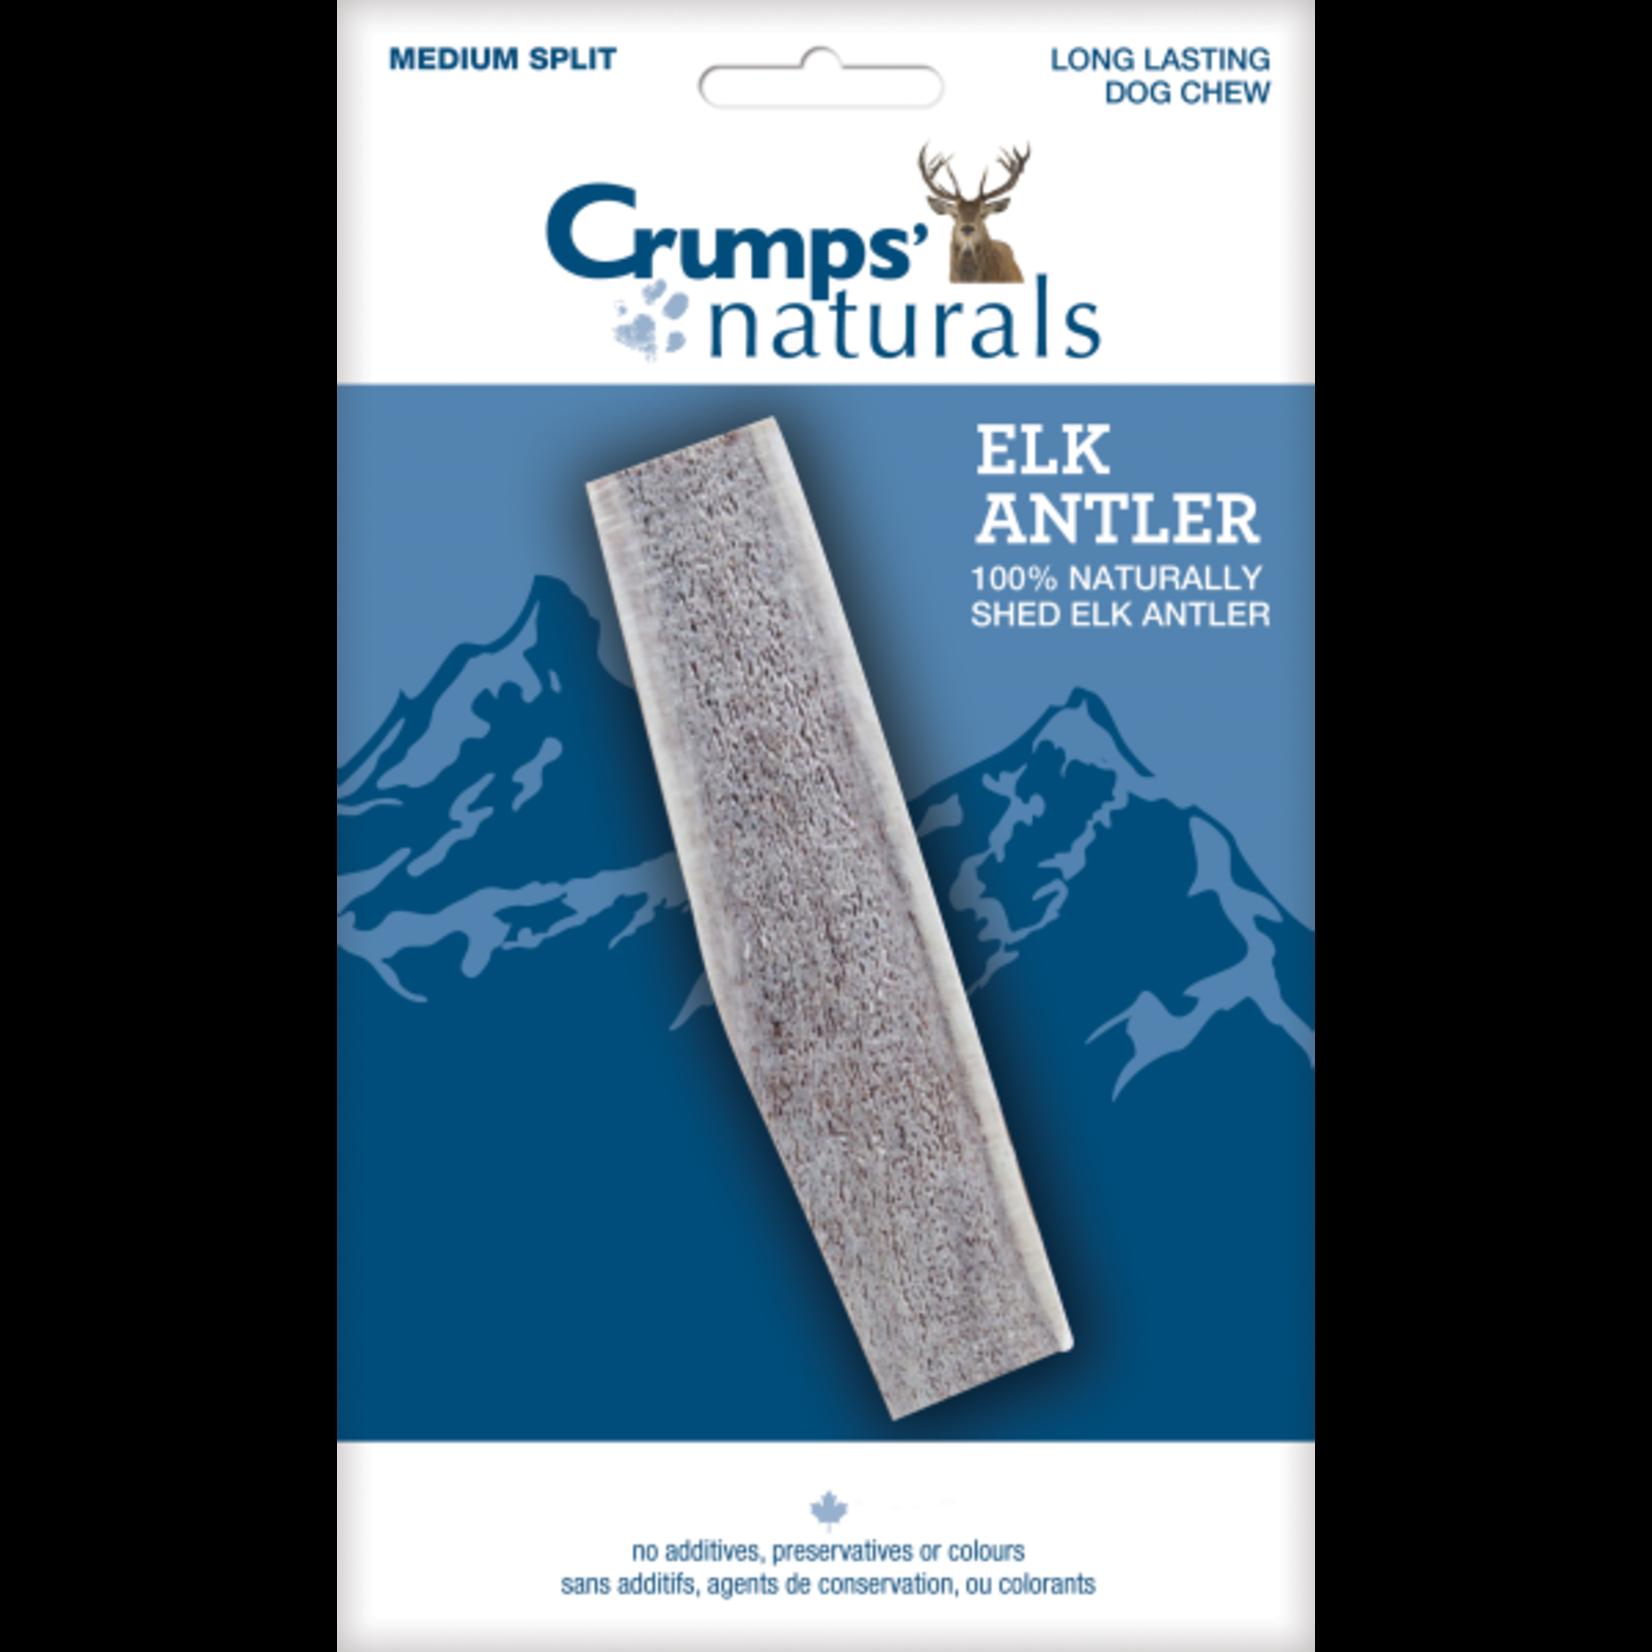 Crumps' Naturals Crumps' Naturals Elk Antler